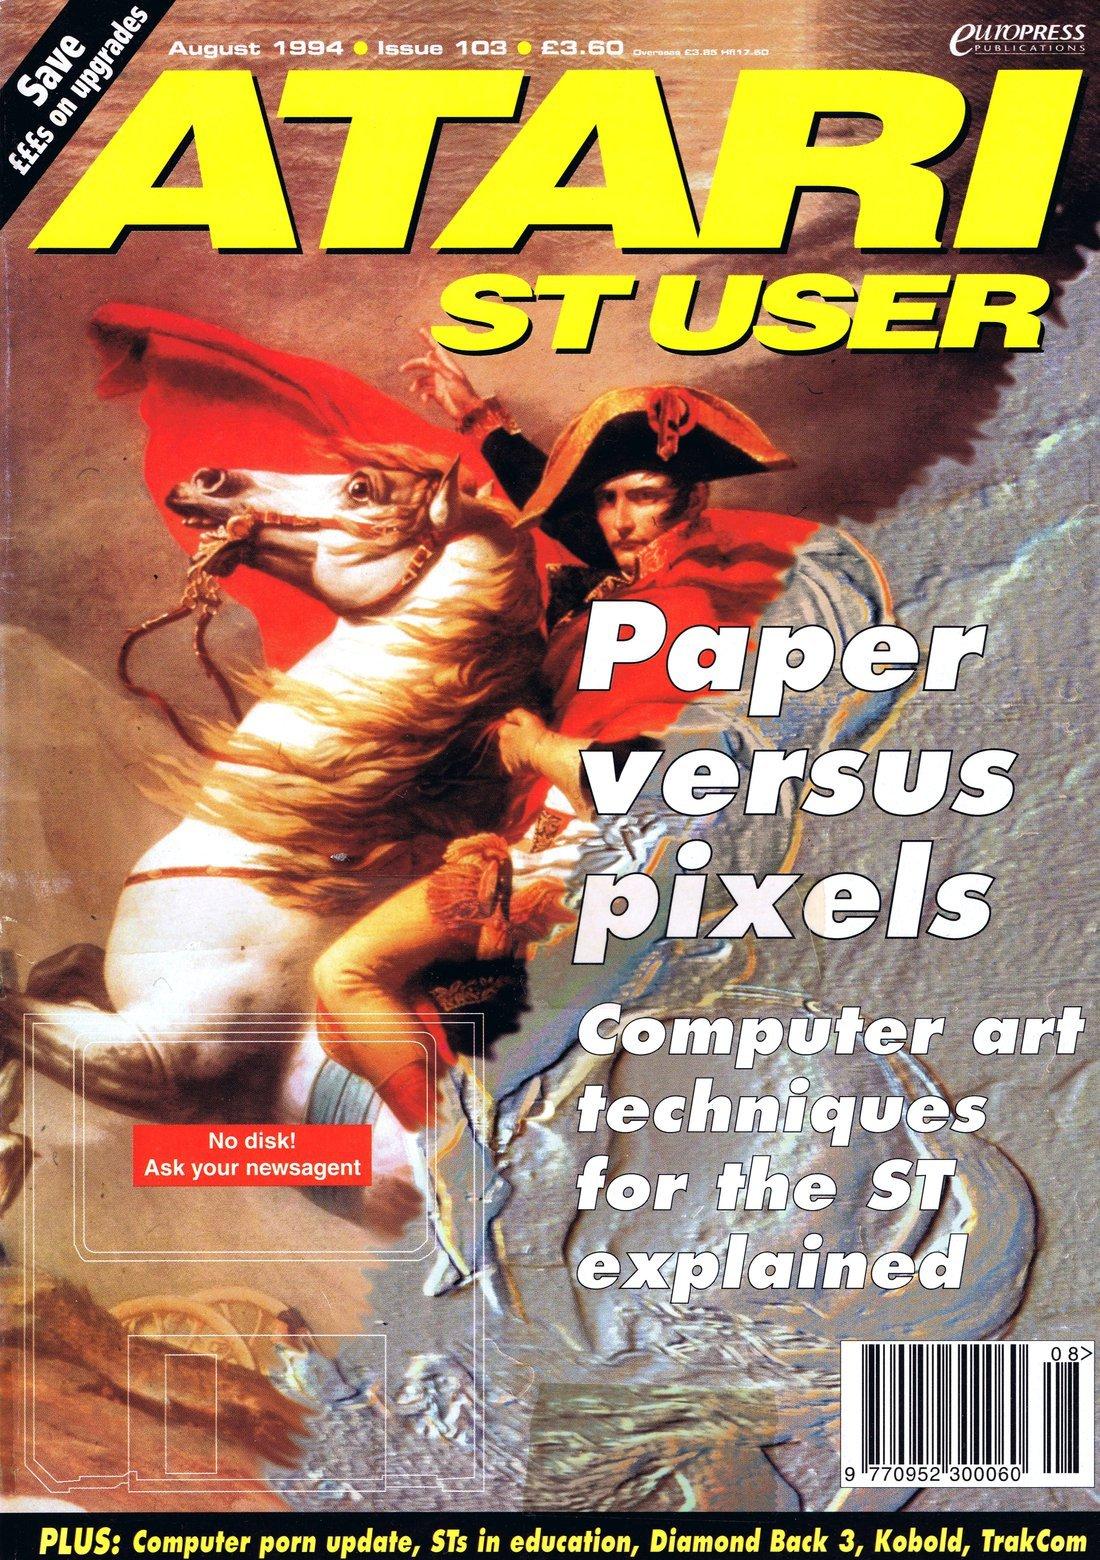 Atari ST User Issue 103 (August 1994)